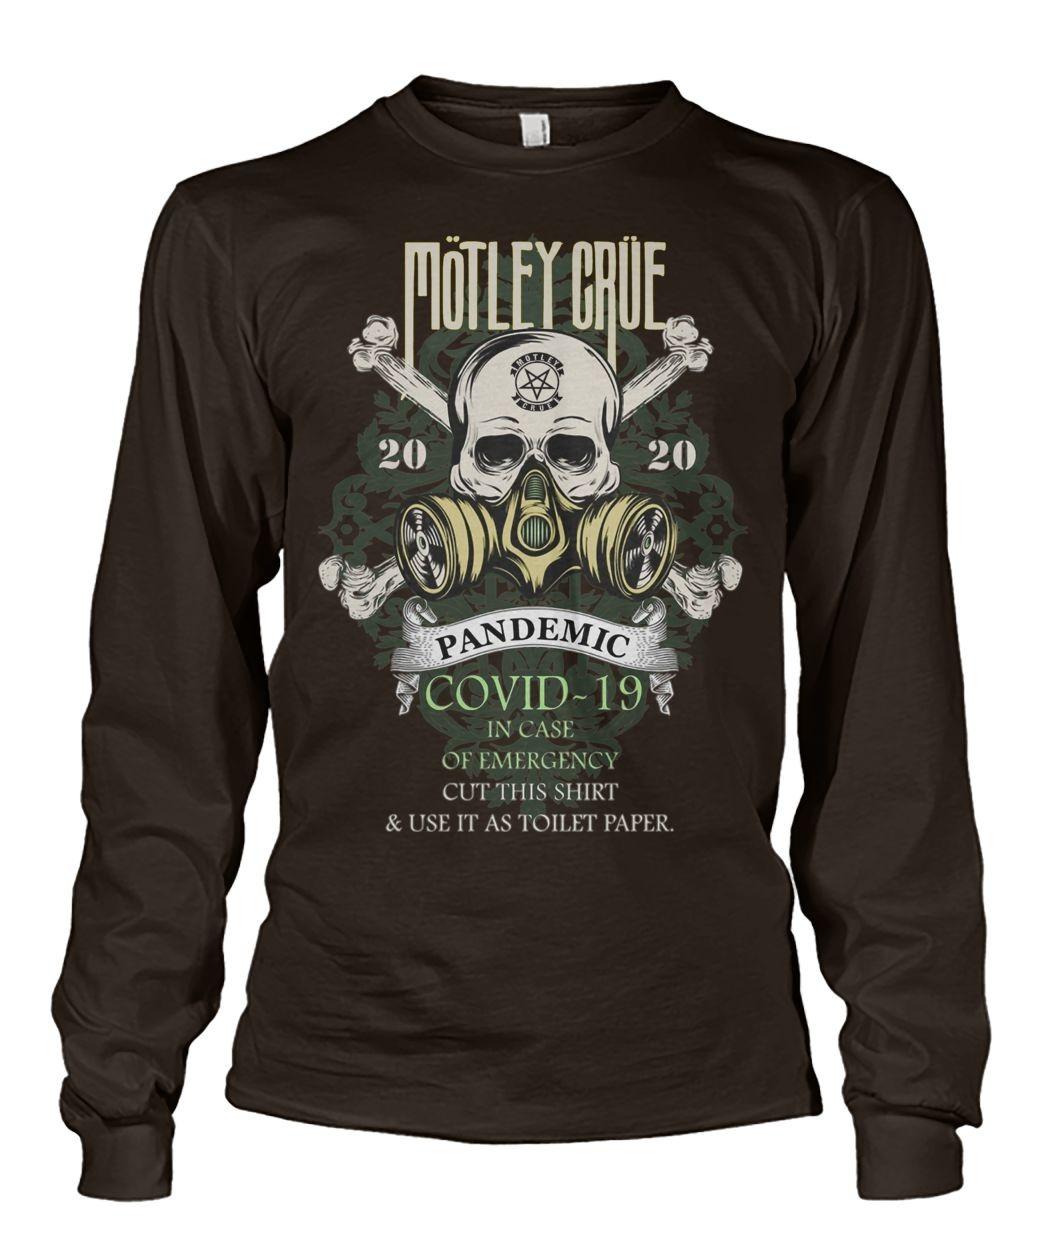 Mötley Crüe 2020 Covid-19 Pandemic Skull Long sleeve